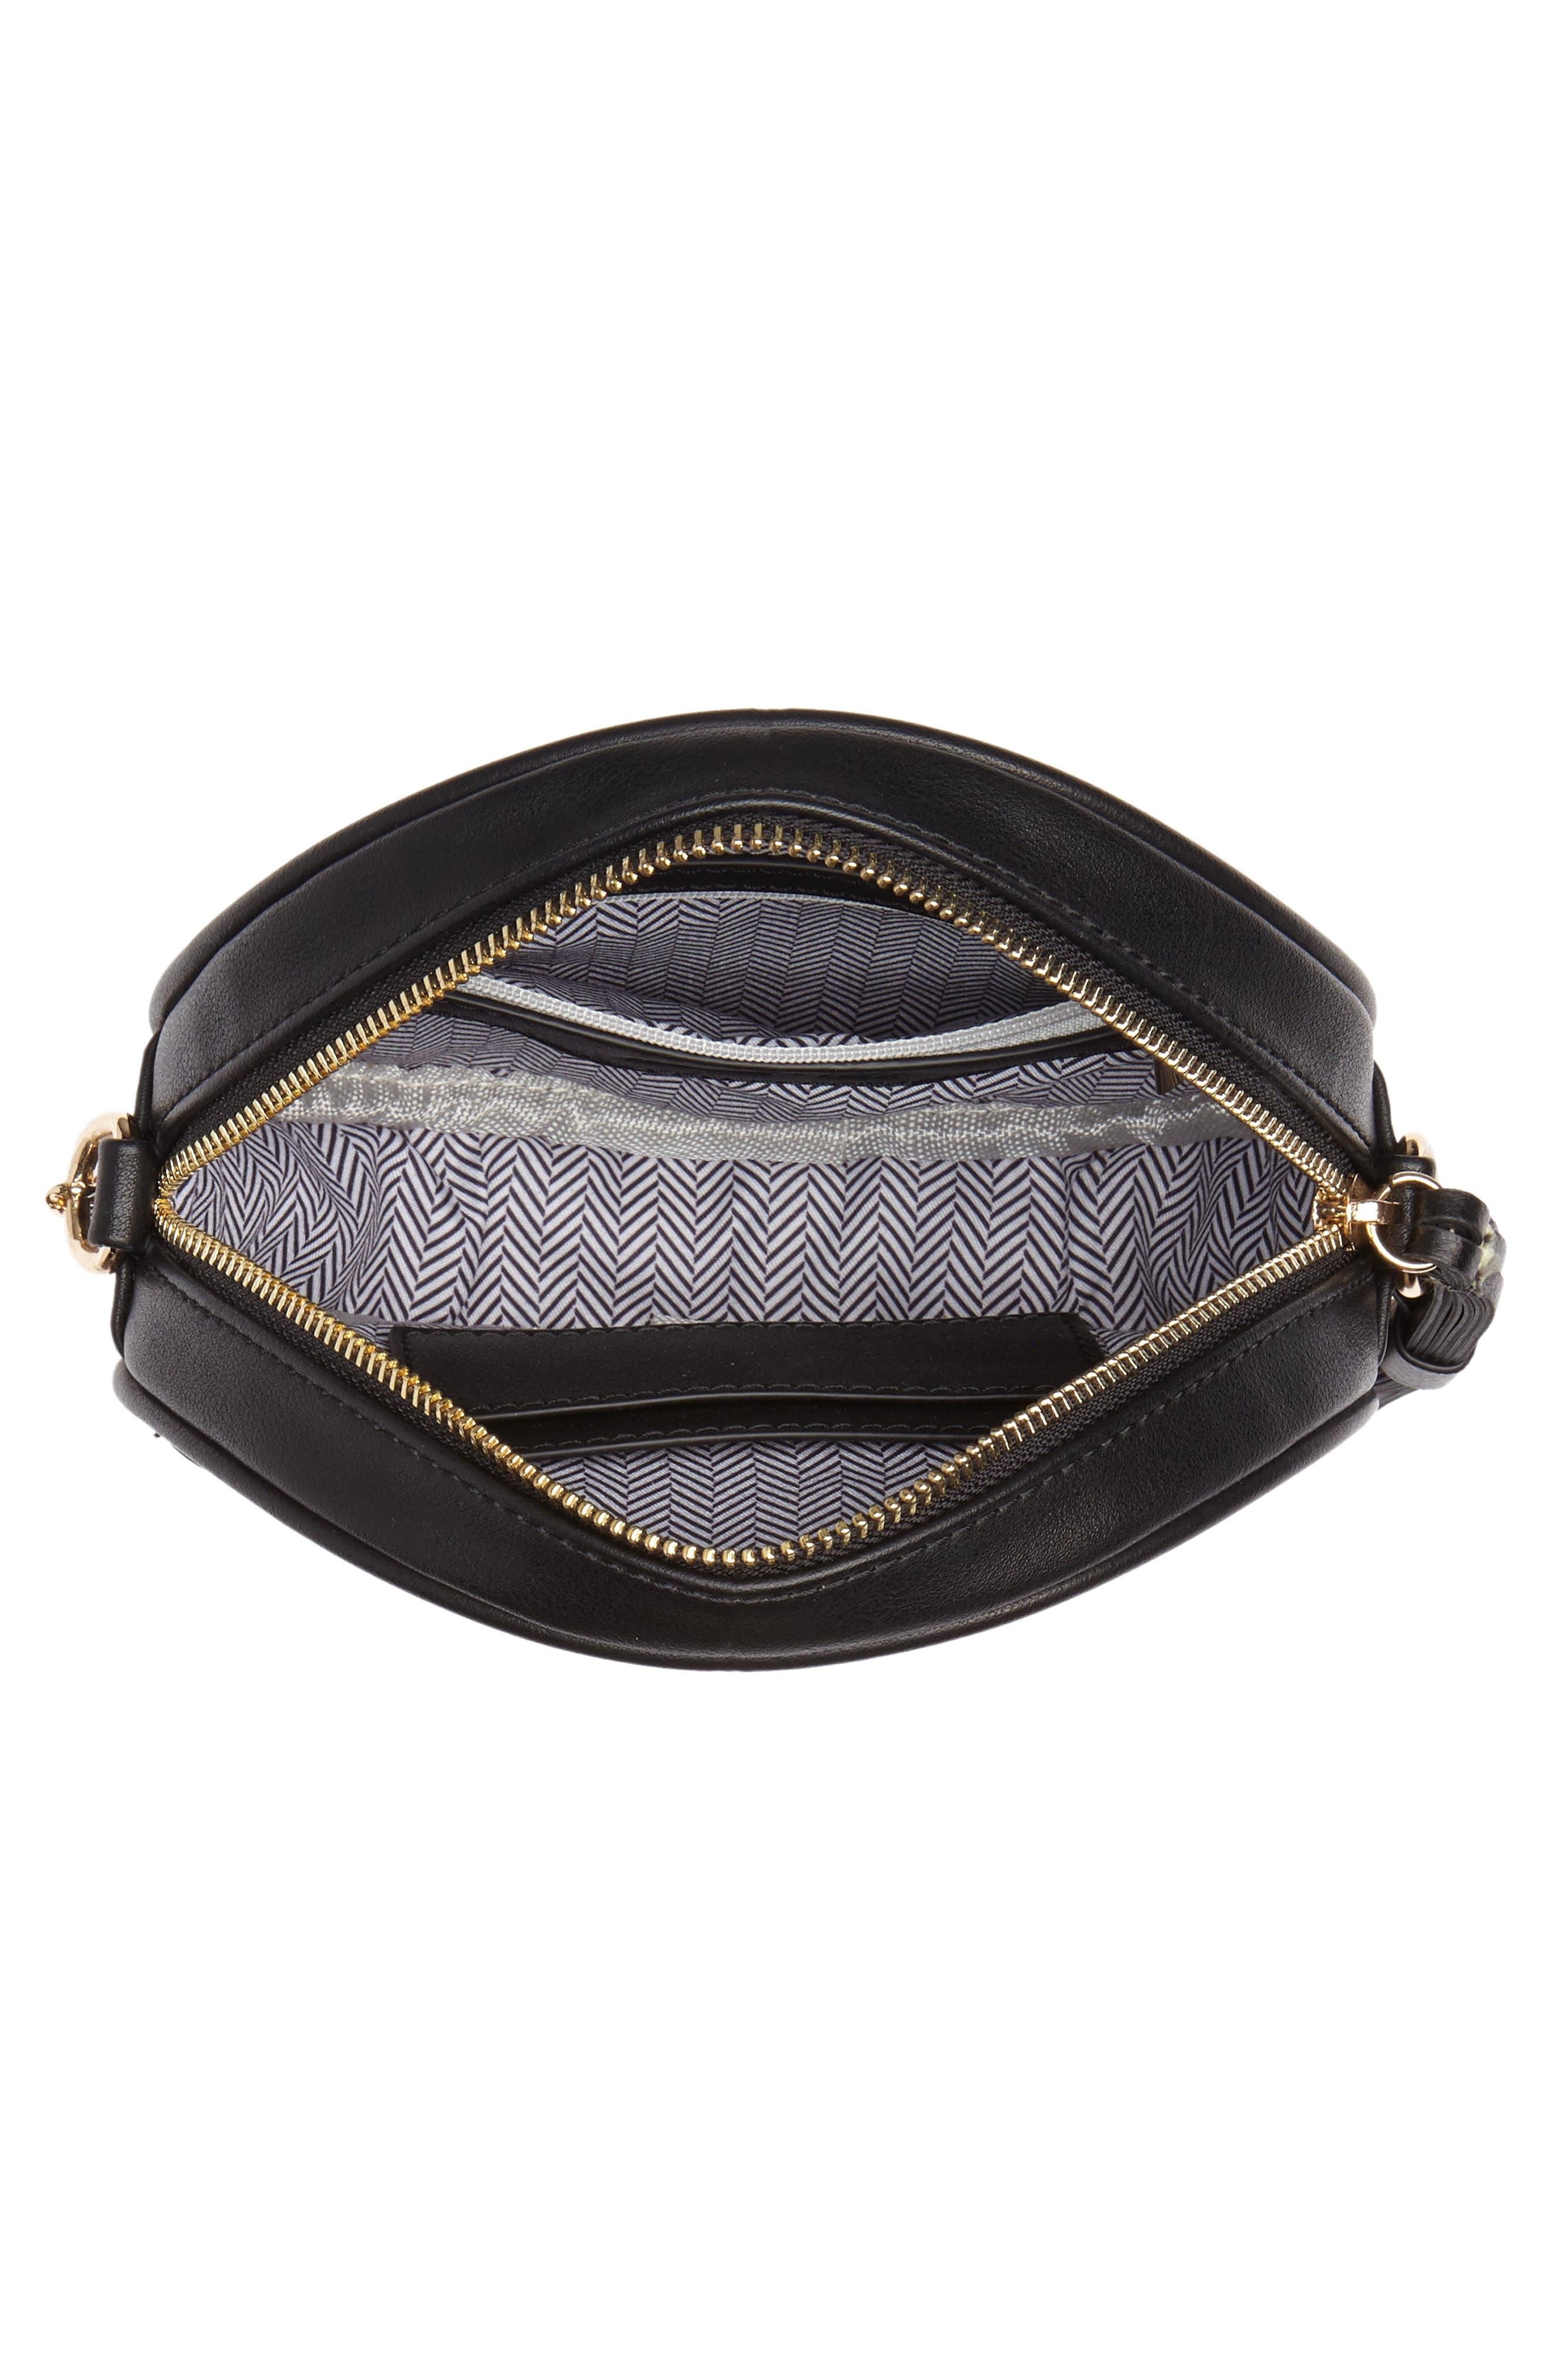 Mali + Lili Payton Vegan Leather Canteen Crossbody Bag,                             Alternate thumbnail 4, color,                             Black/ White